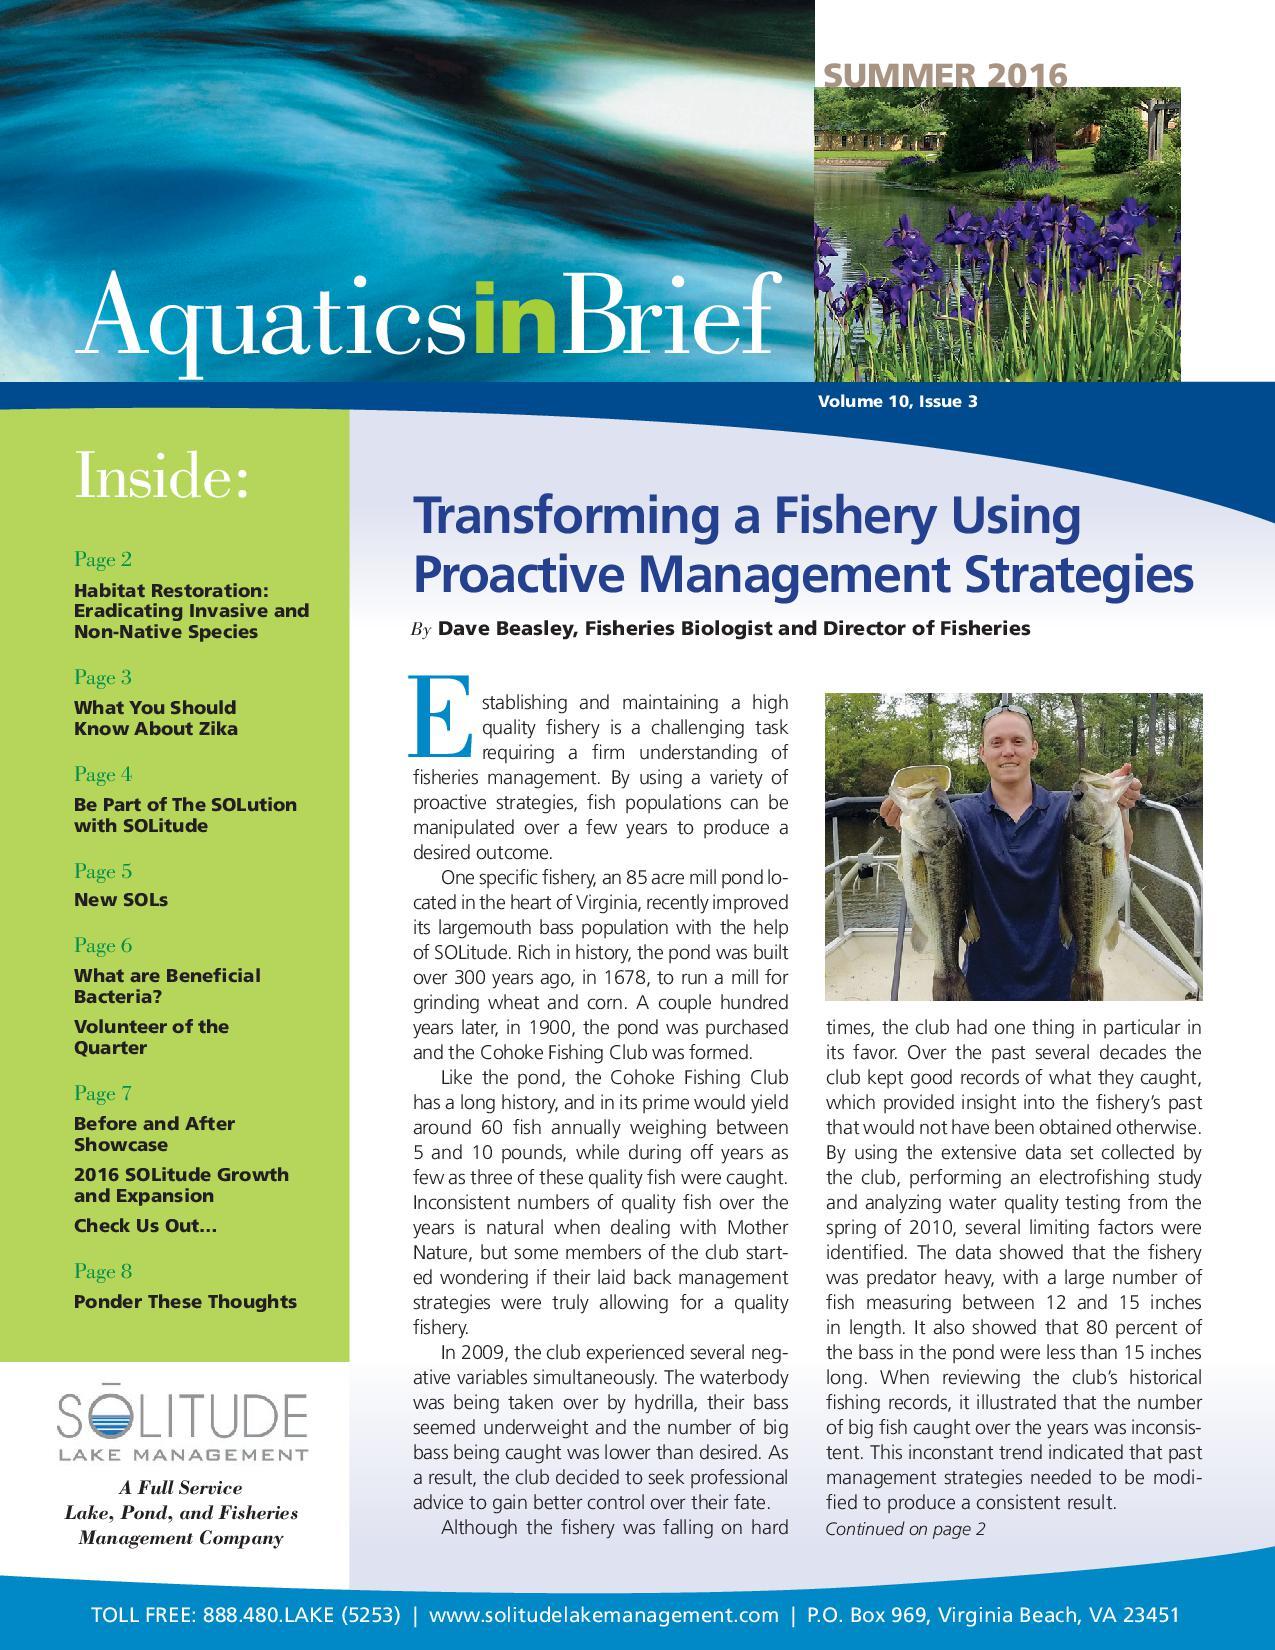 aquatics-in-brief-summer-2016